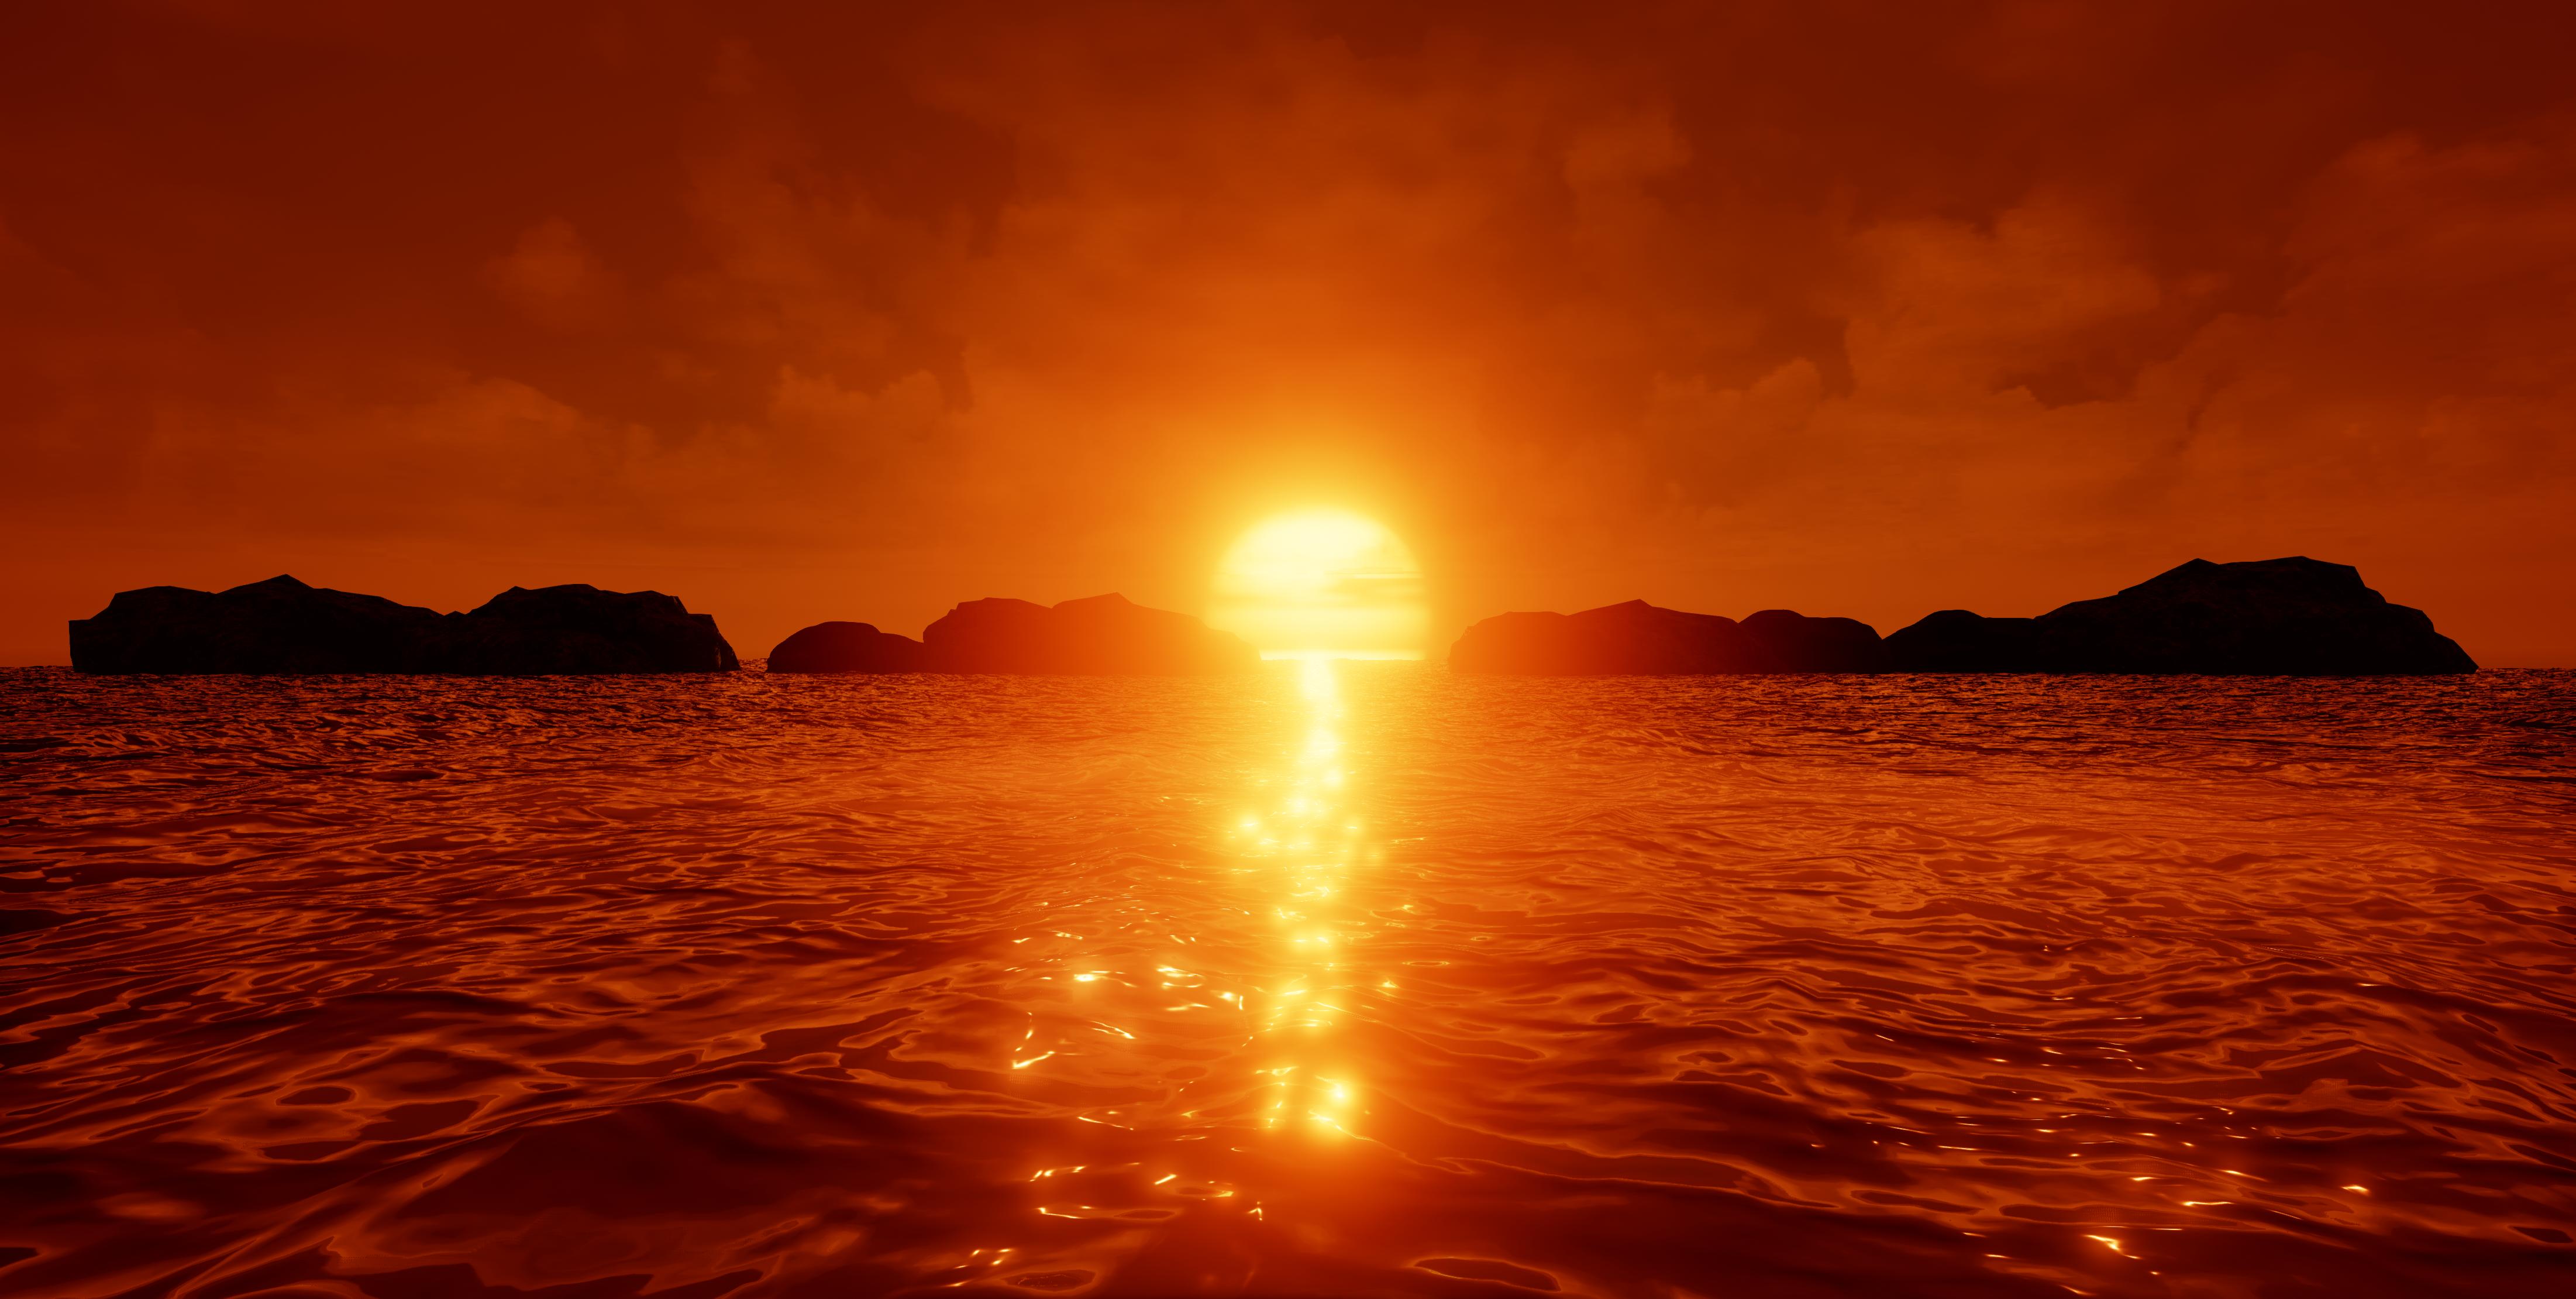 Sunset 4k Ultra Hd Wallpaper Background Image 4404x2220 Id